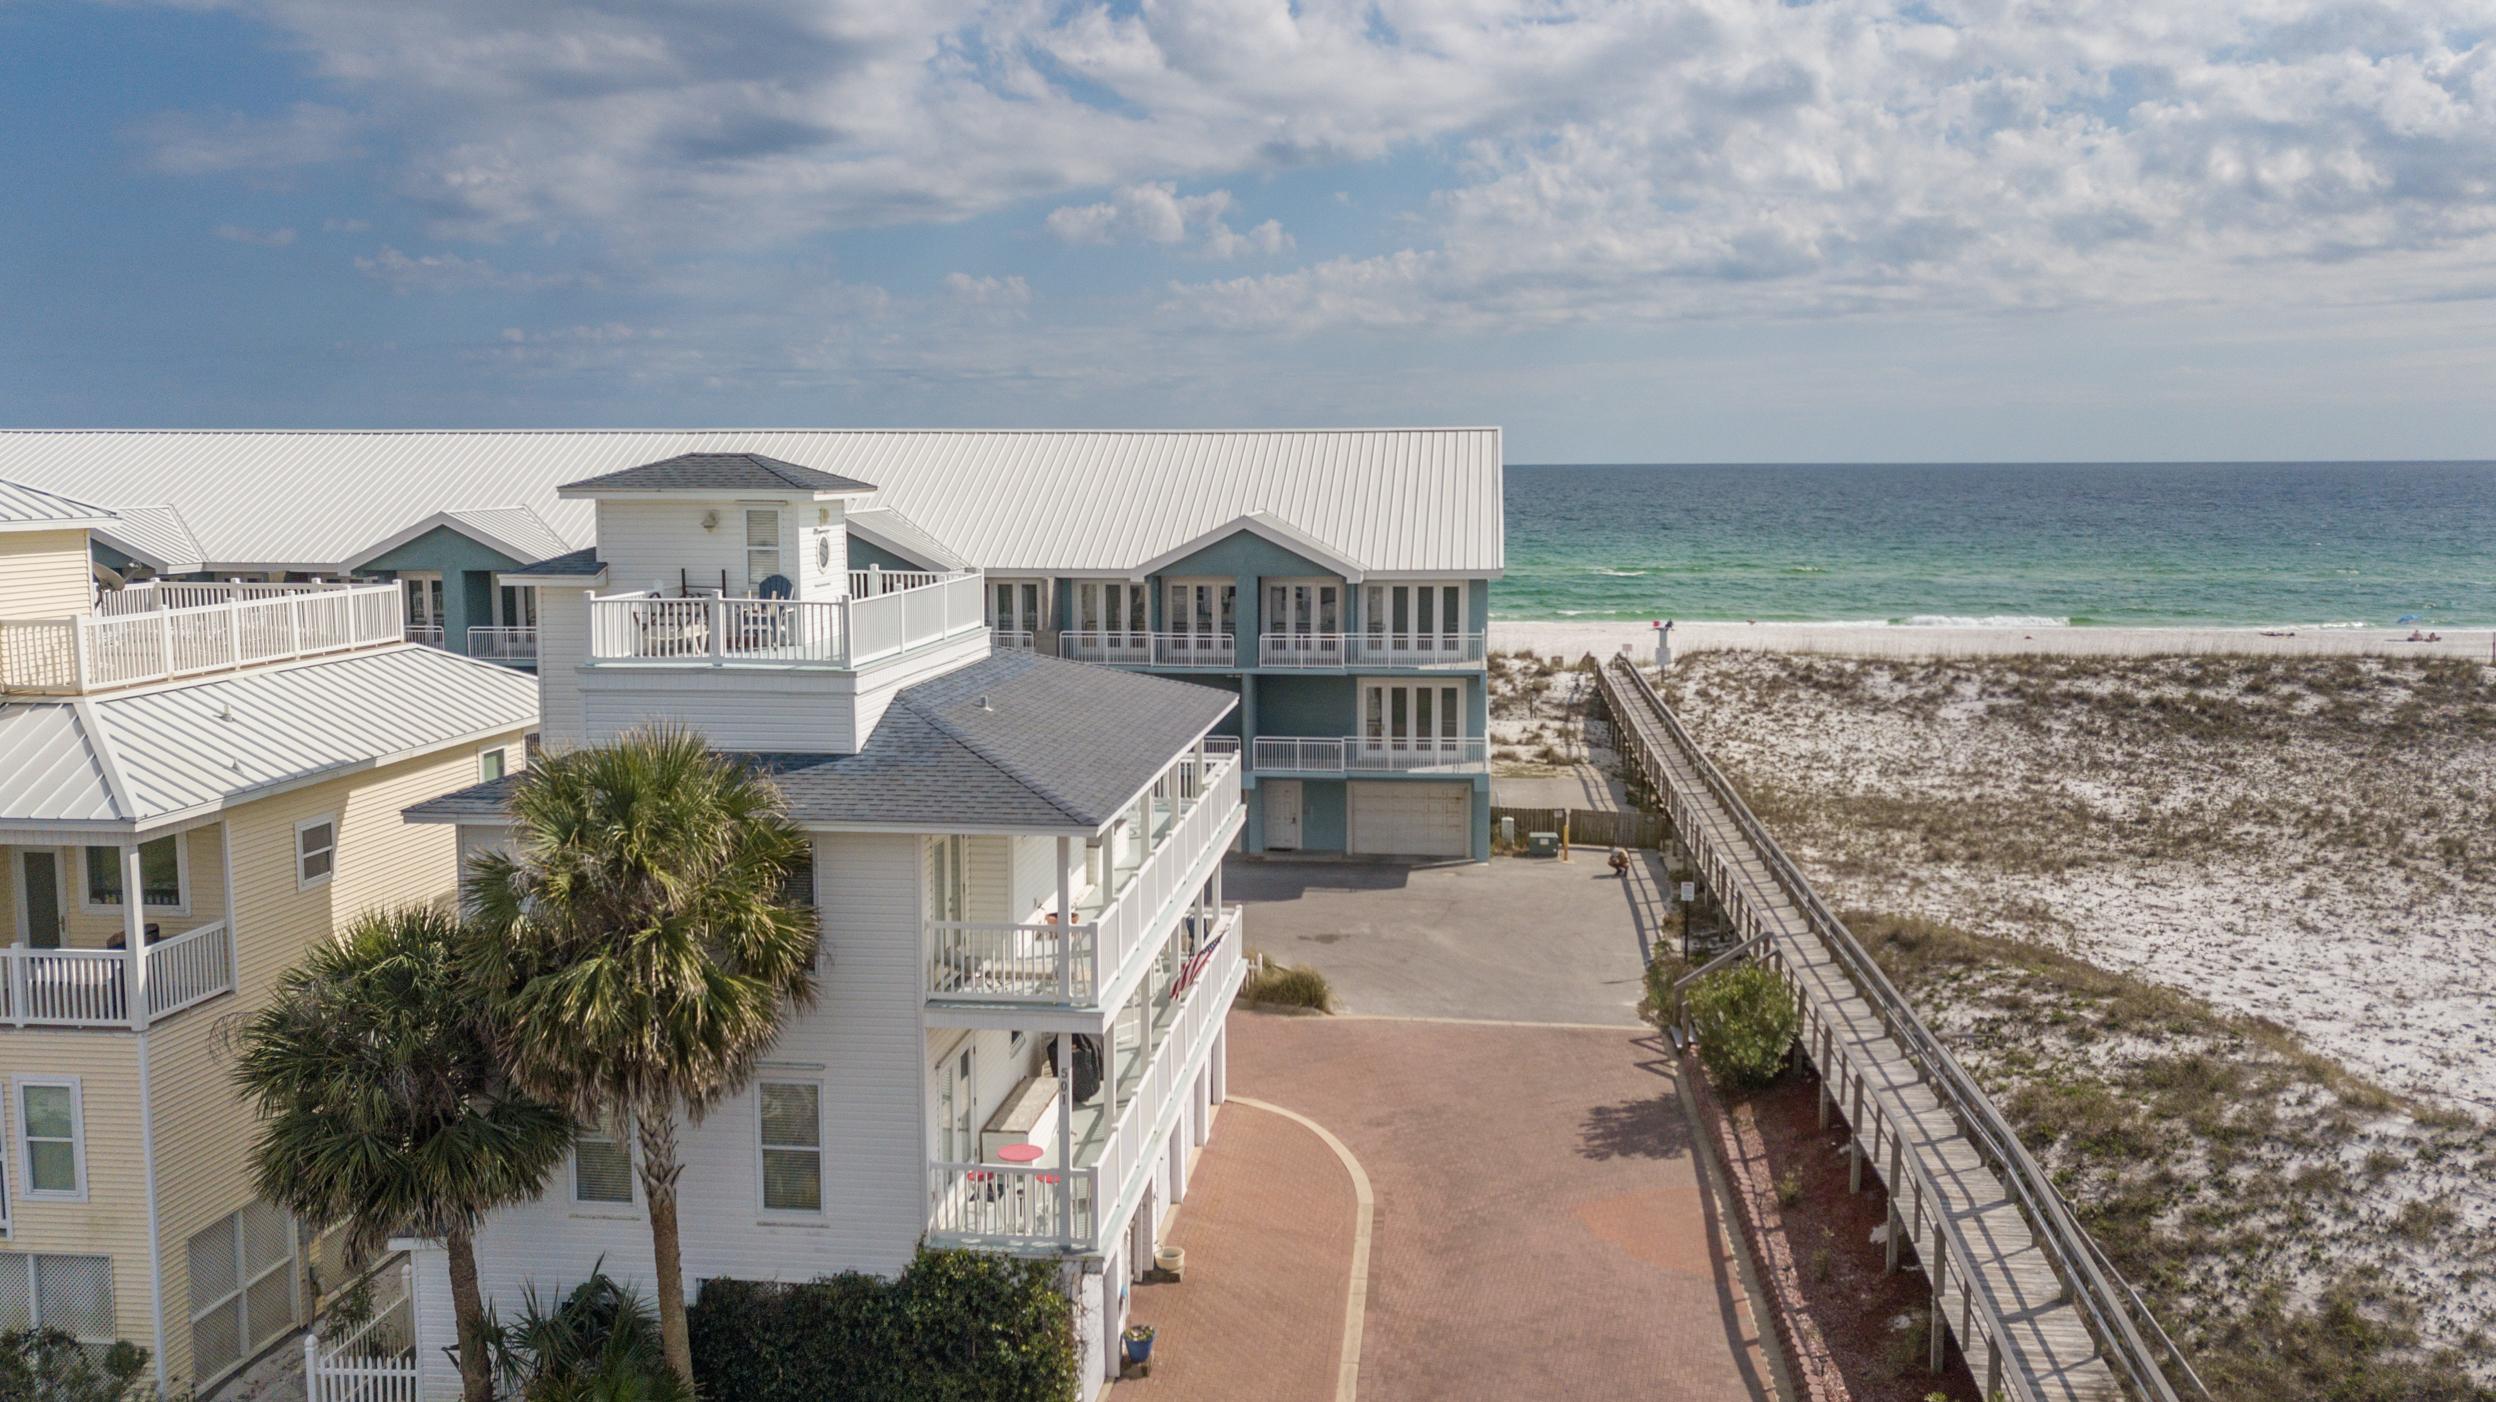 White Sands Cottage 501 Life's a Beach House Townhouse rental in White Sands Pensacola Beach in Pensacola Beach Florida - #59